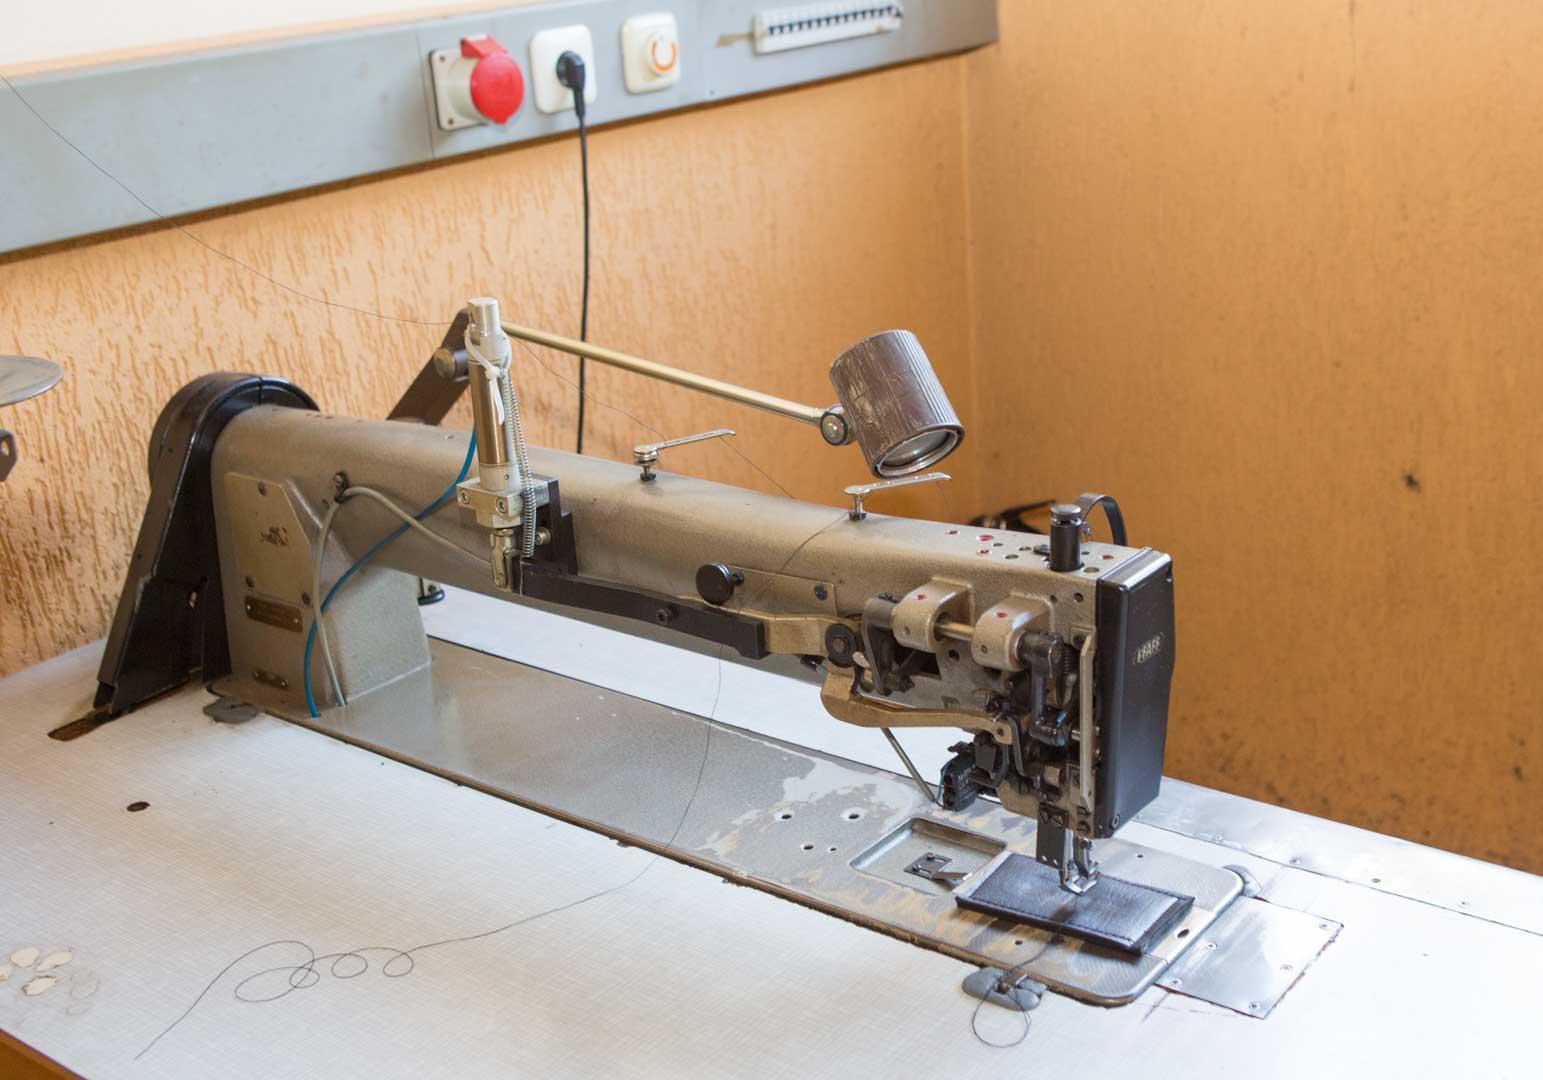 Sieck: PFAFF Kl. 1245-706/48 long arm sewing machine with 650 mm ... : pfaff long arm quilting machine - Adamdwight.com